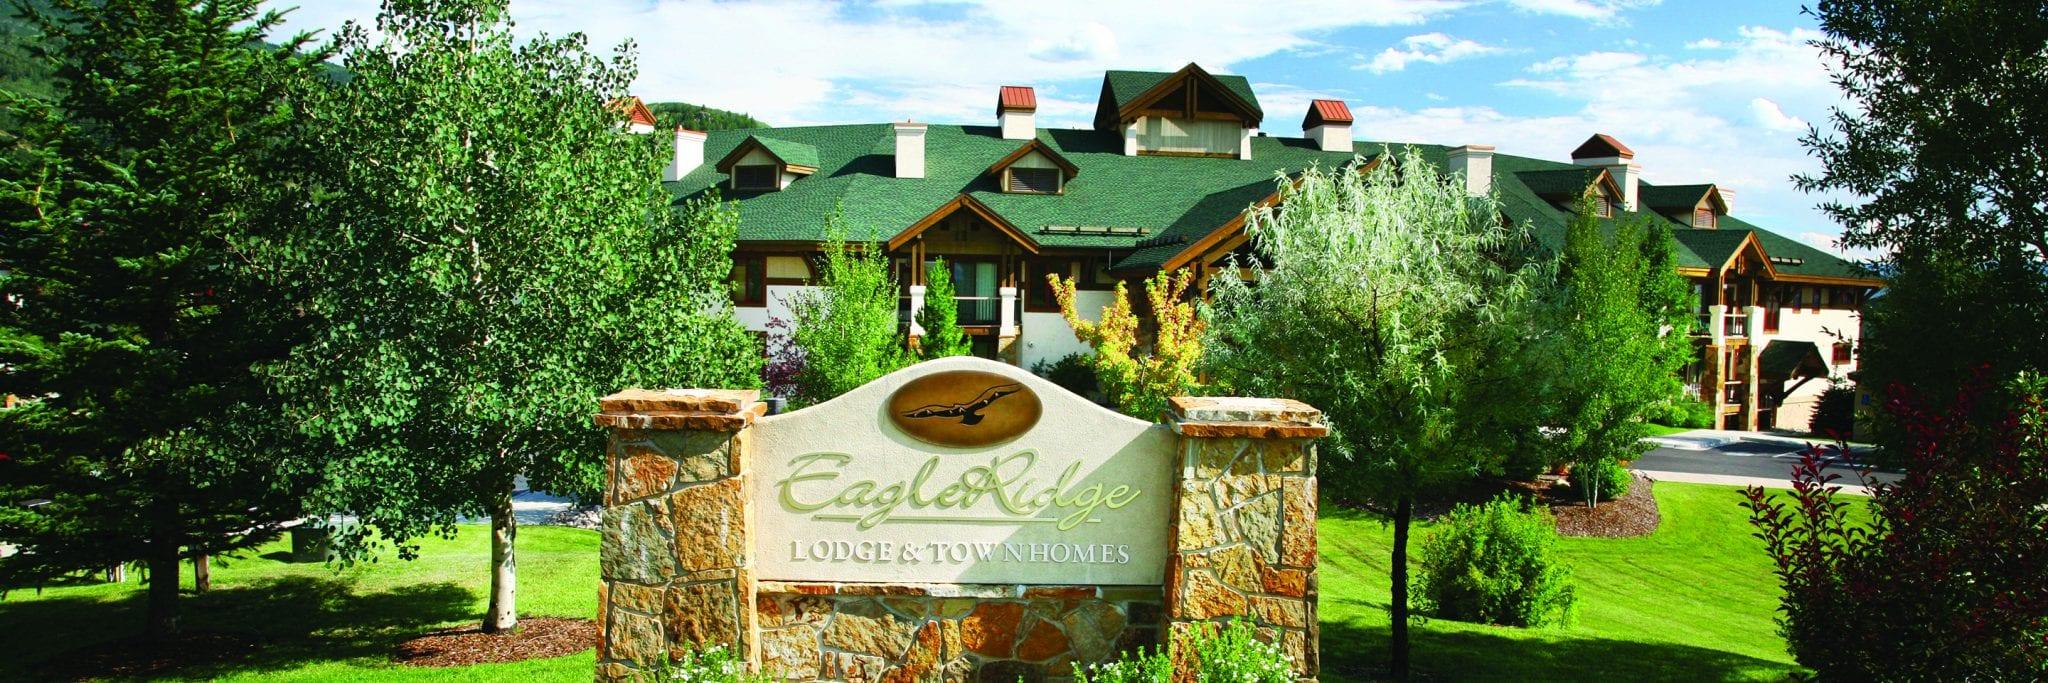 Eagleridge Lodge & Townhomes by Wyndham Vacation Rentals.